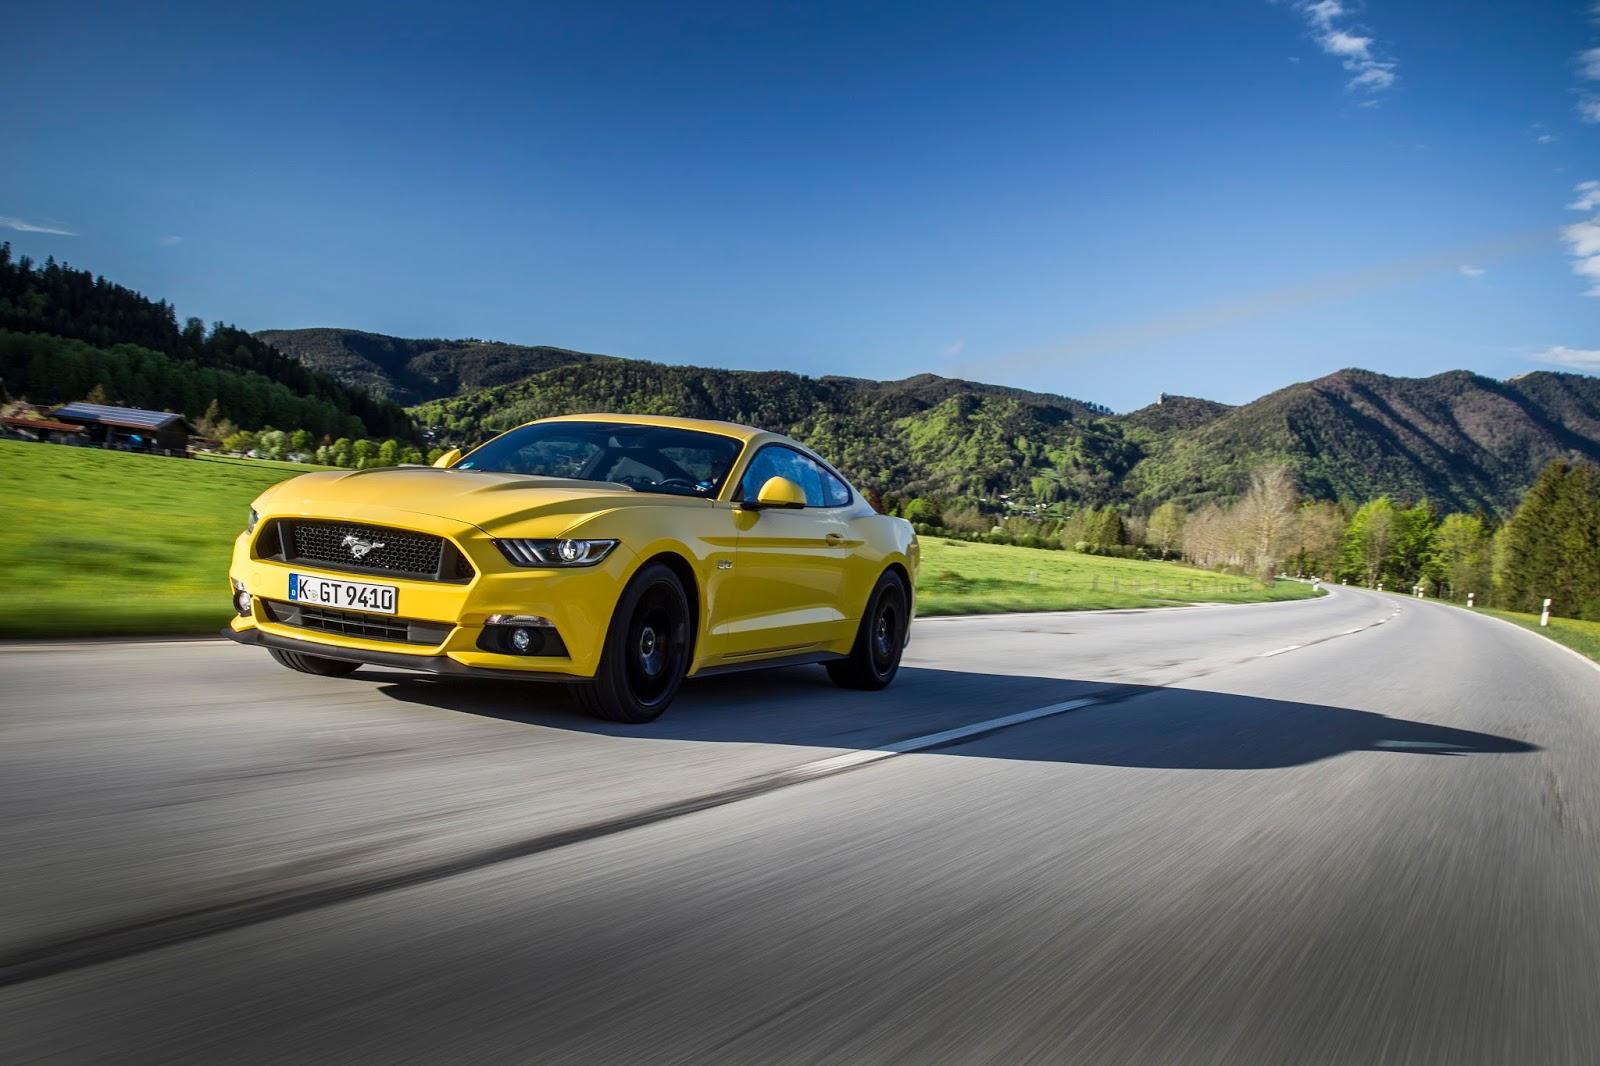 FordMustang Fastback Yellow 01 Δες το τετρακίνητο Ford Focus RS και την νέα Mustang παρέα με όλα τα Ford στην έκθεση αυτοκινήτου 2015